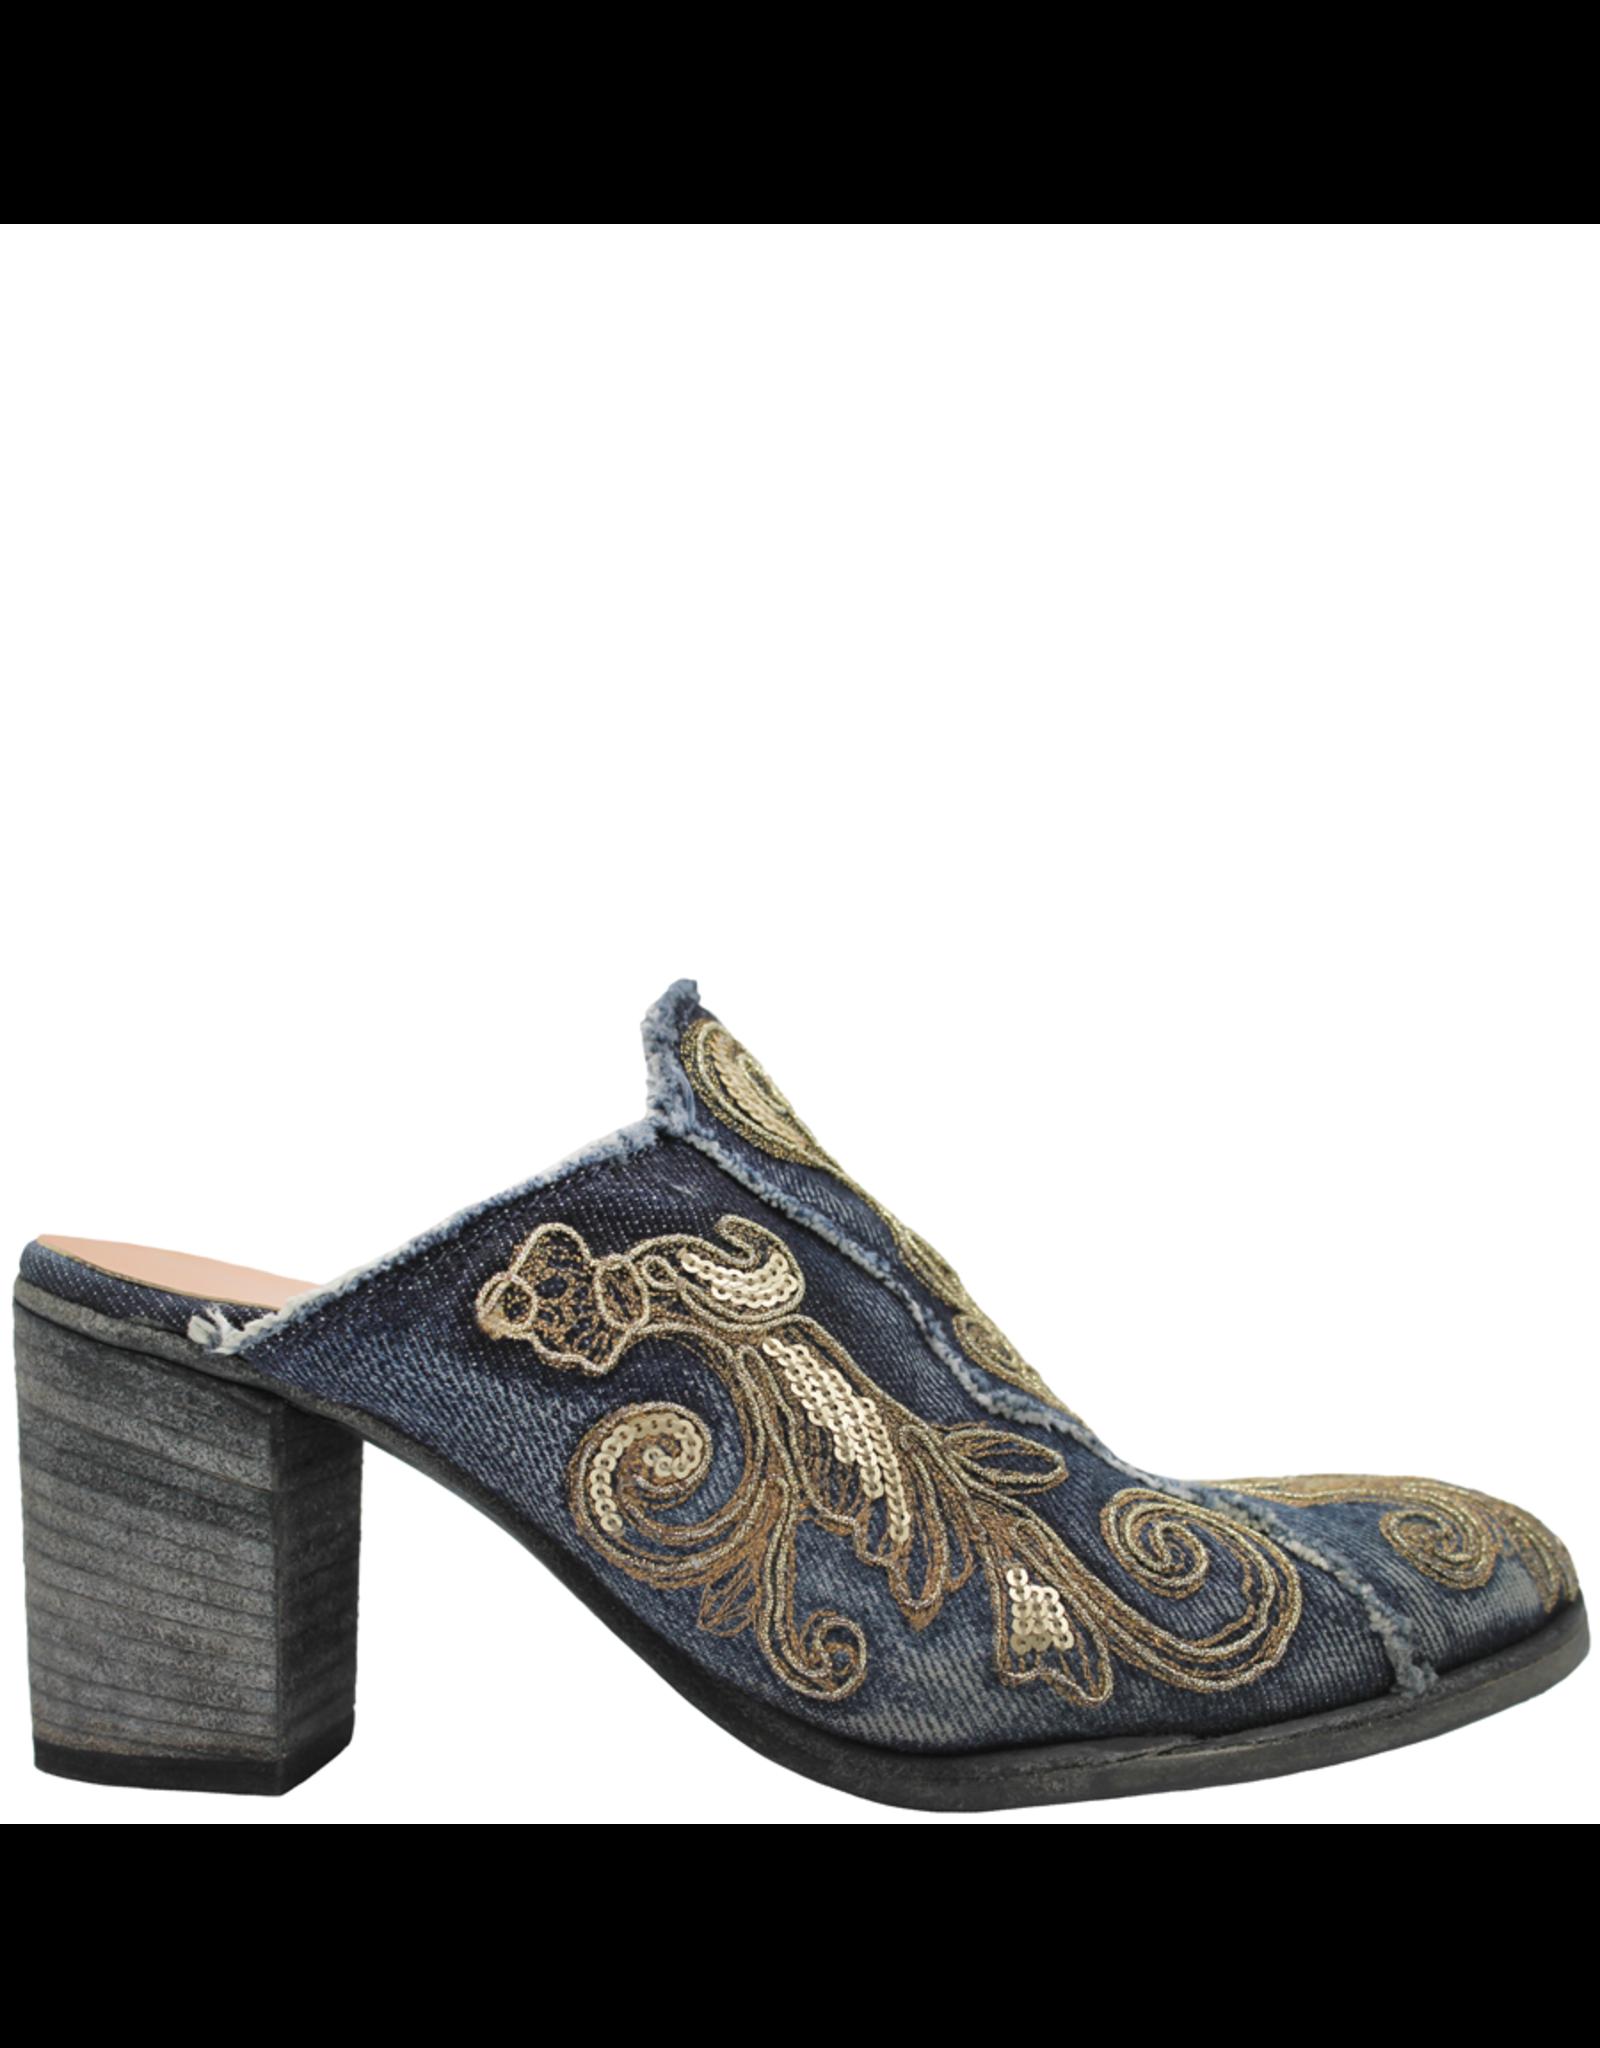 FauzianJeunesse FauzianJuenesse Blue Denim Mule With Gold Embroidery 3583